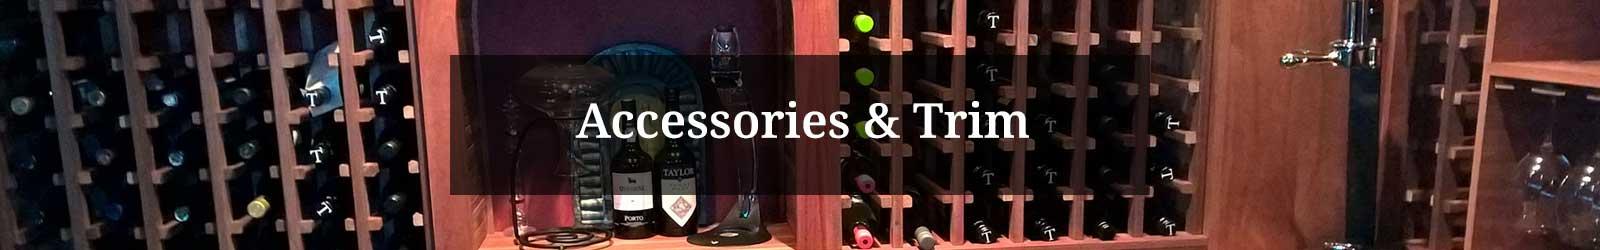 Accessories and Trim